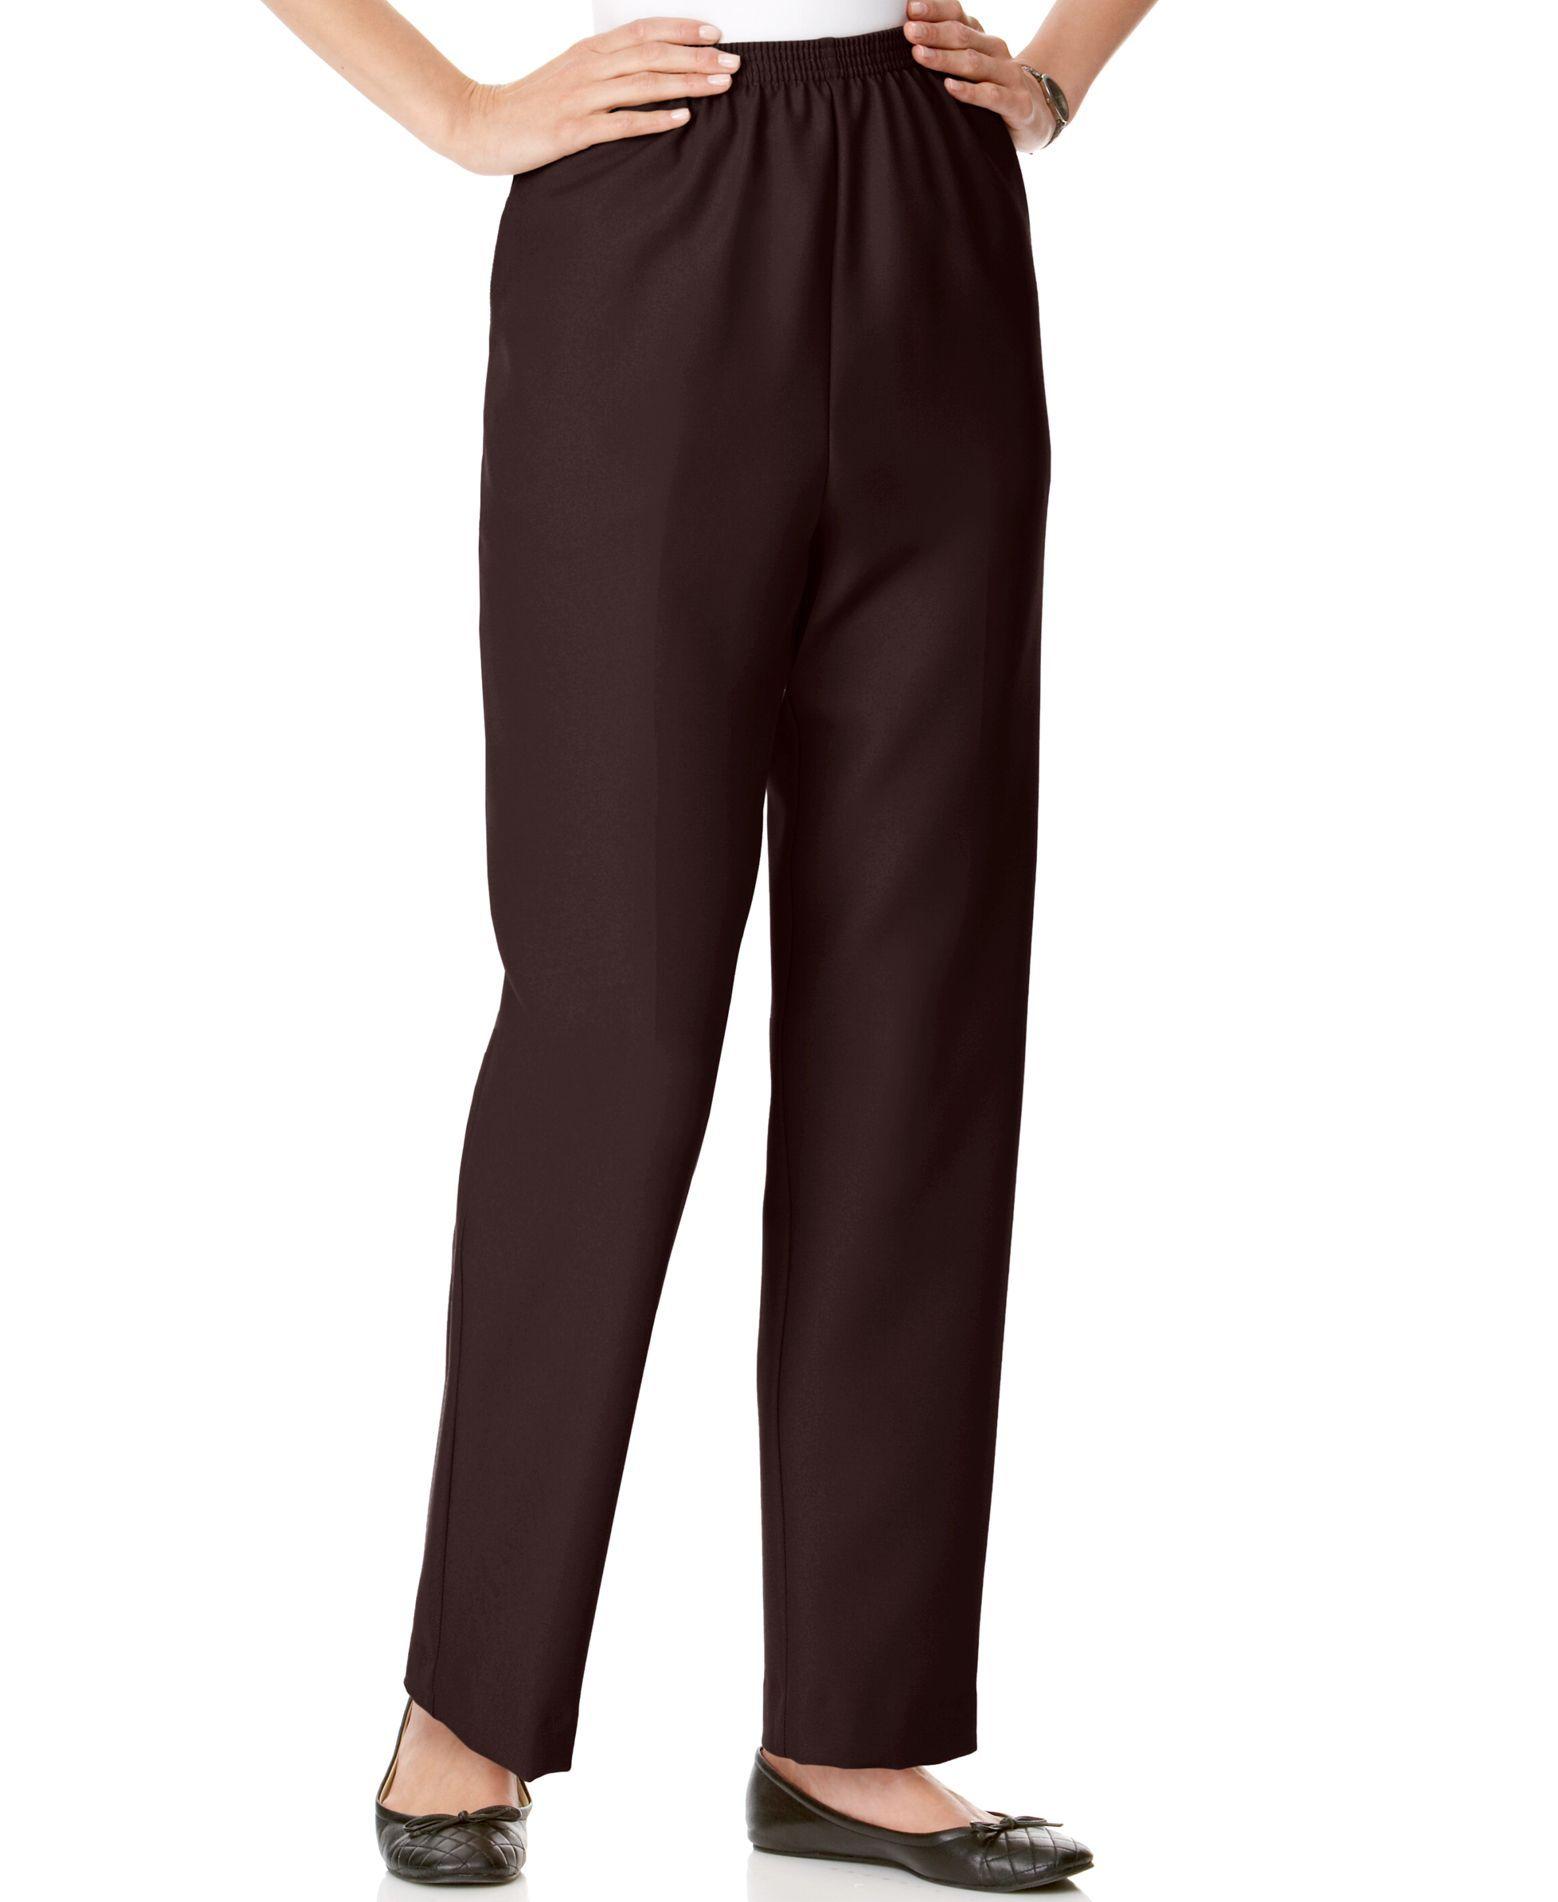 f2434159e30f7 Petite Pull-On Straight-Leg Pants